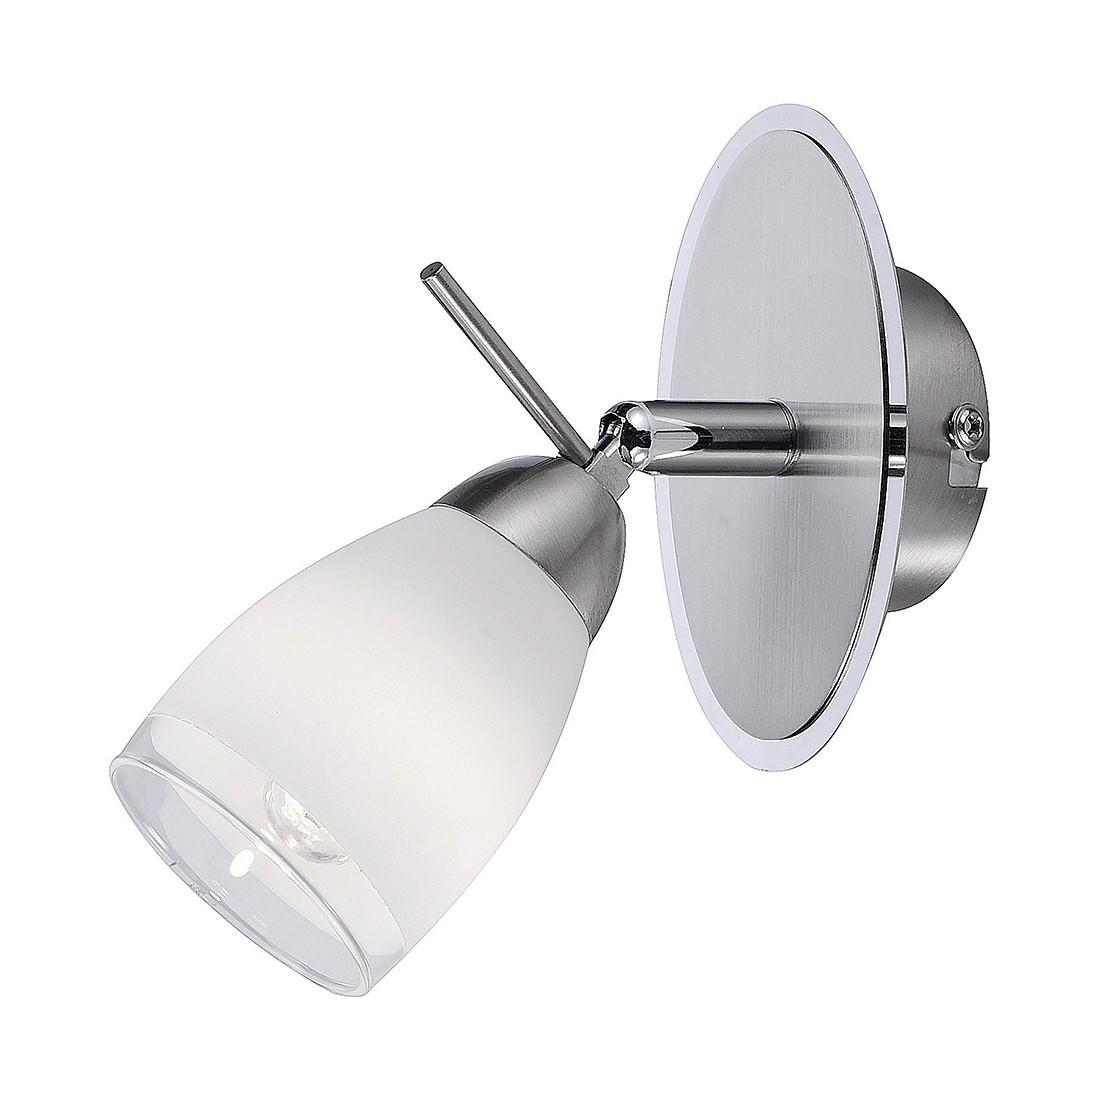 Wandleuchte Vino by Leuchten Direkt ● Eisen/Stahl ● Silber ● 1-flammig- Leuchten Direkt A++